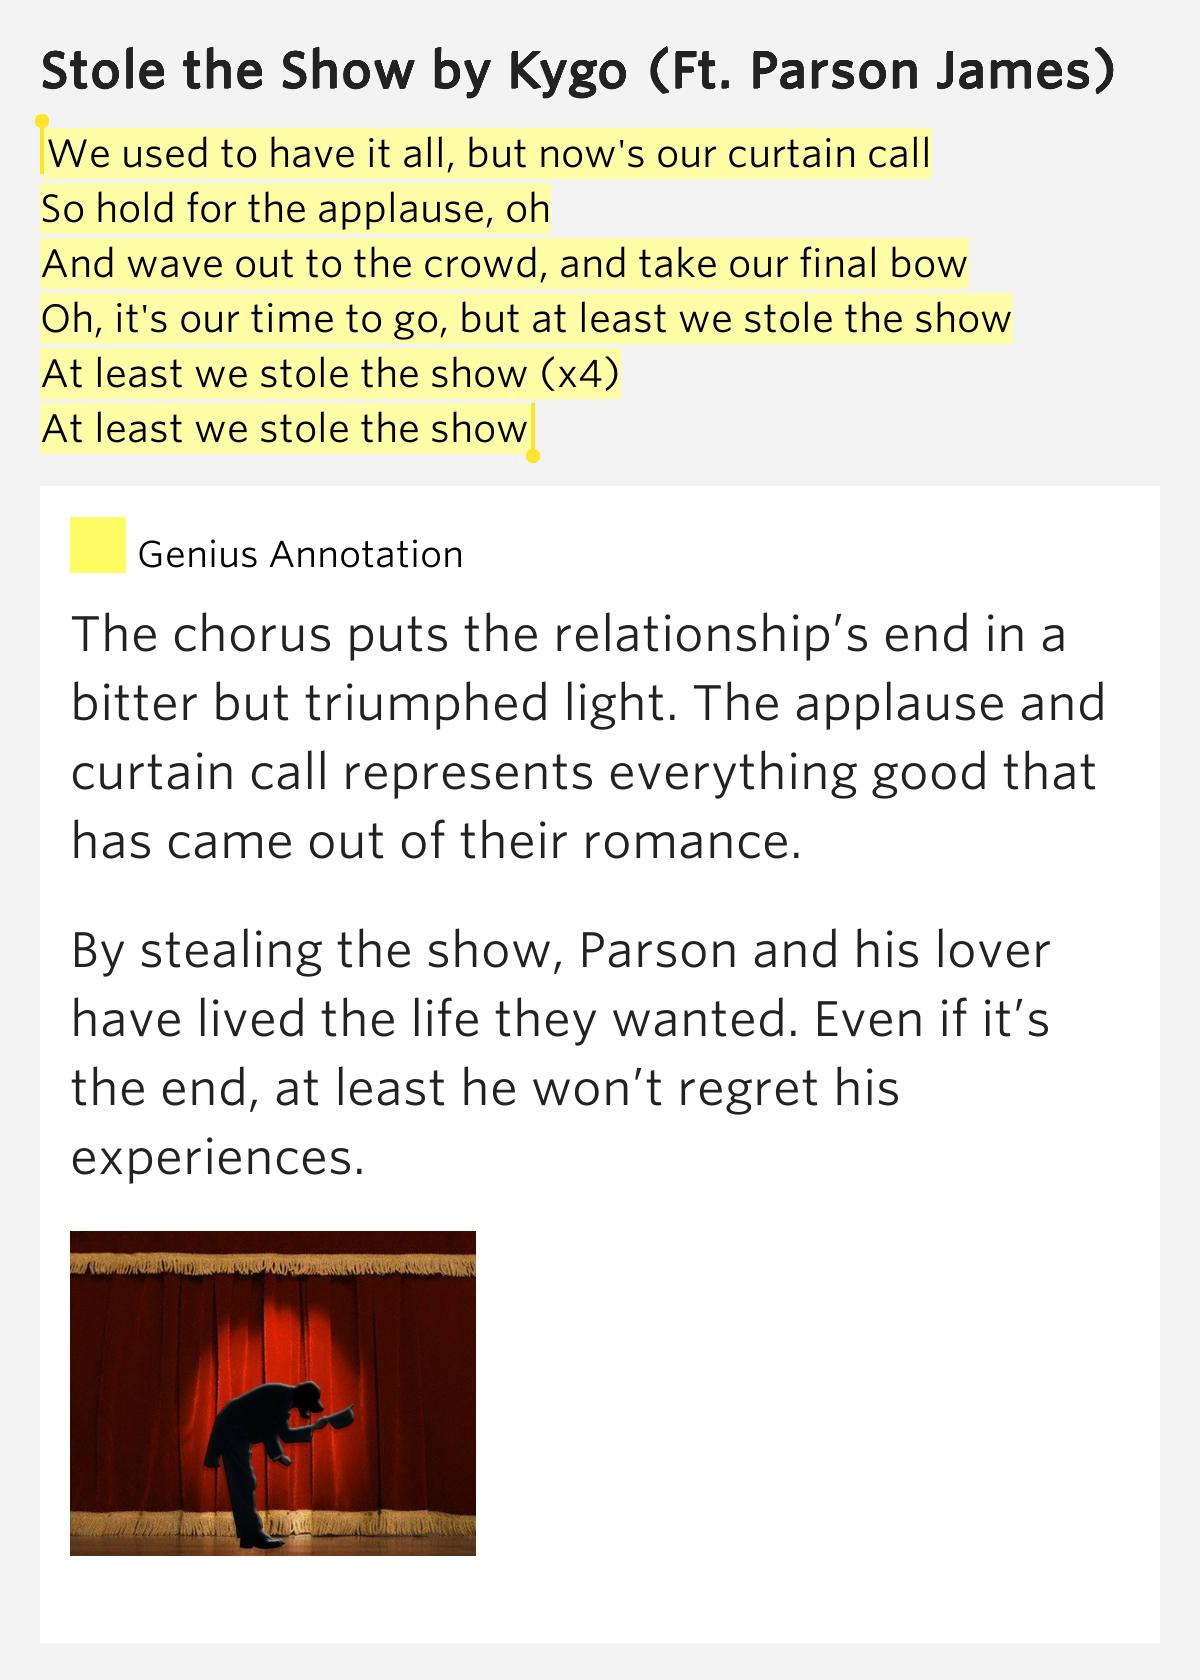 Songtext von Kygo - Stole The Show Lyrics